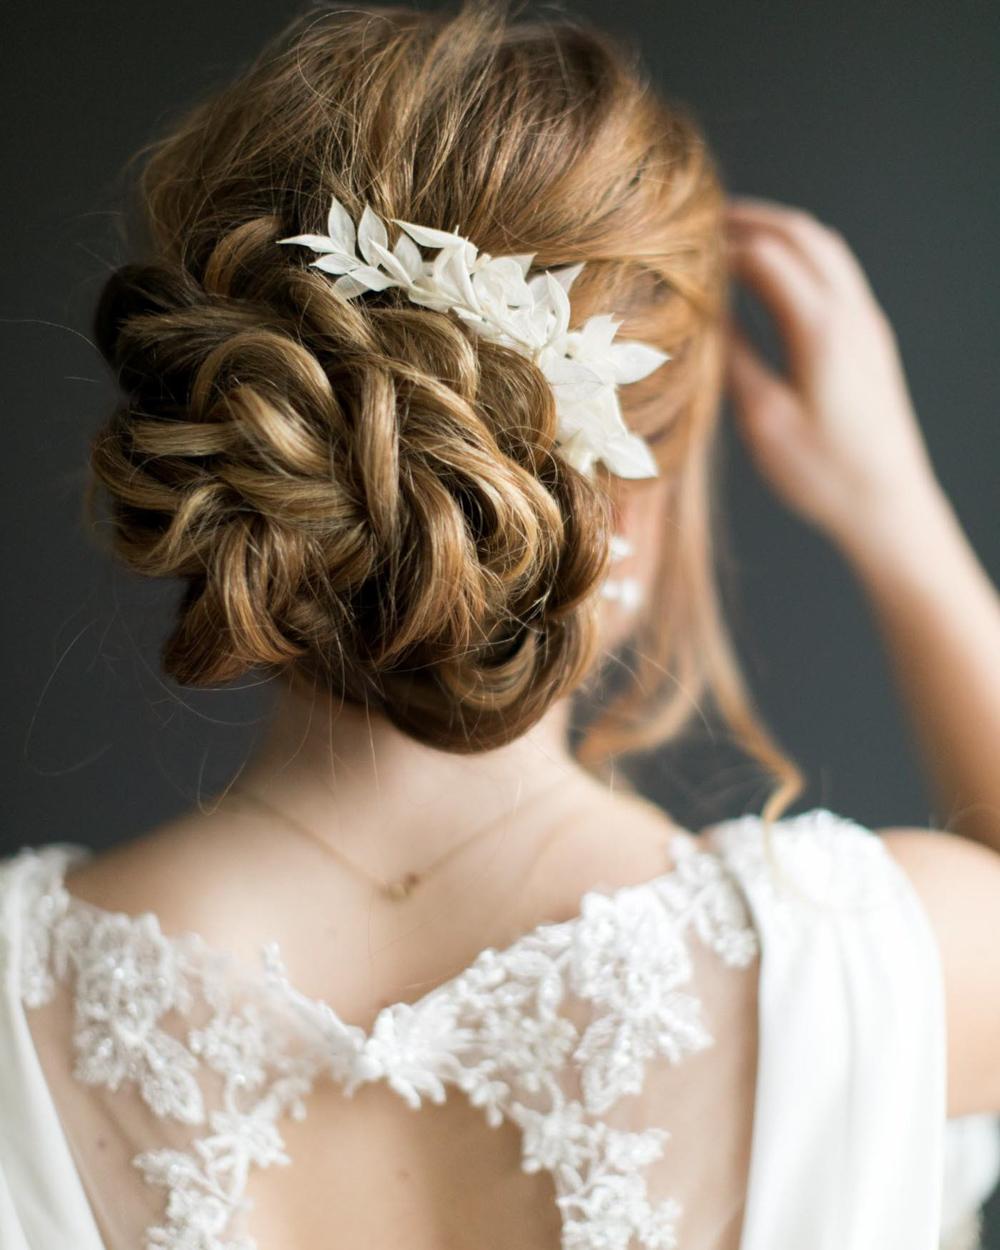 vineyard-bride-vendor-spotlight-honor-beauty-niagara-toronto-southern-ontario-wedding-hair-makeup-artist-mobile004.jpg